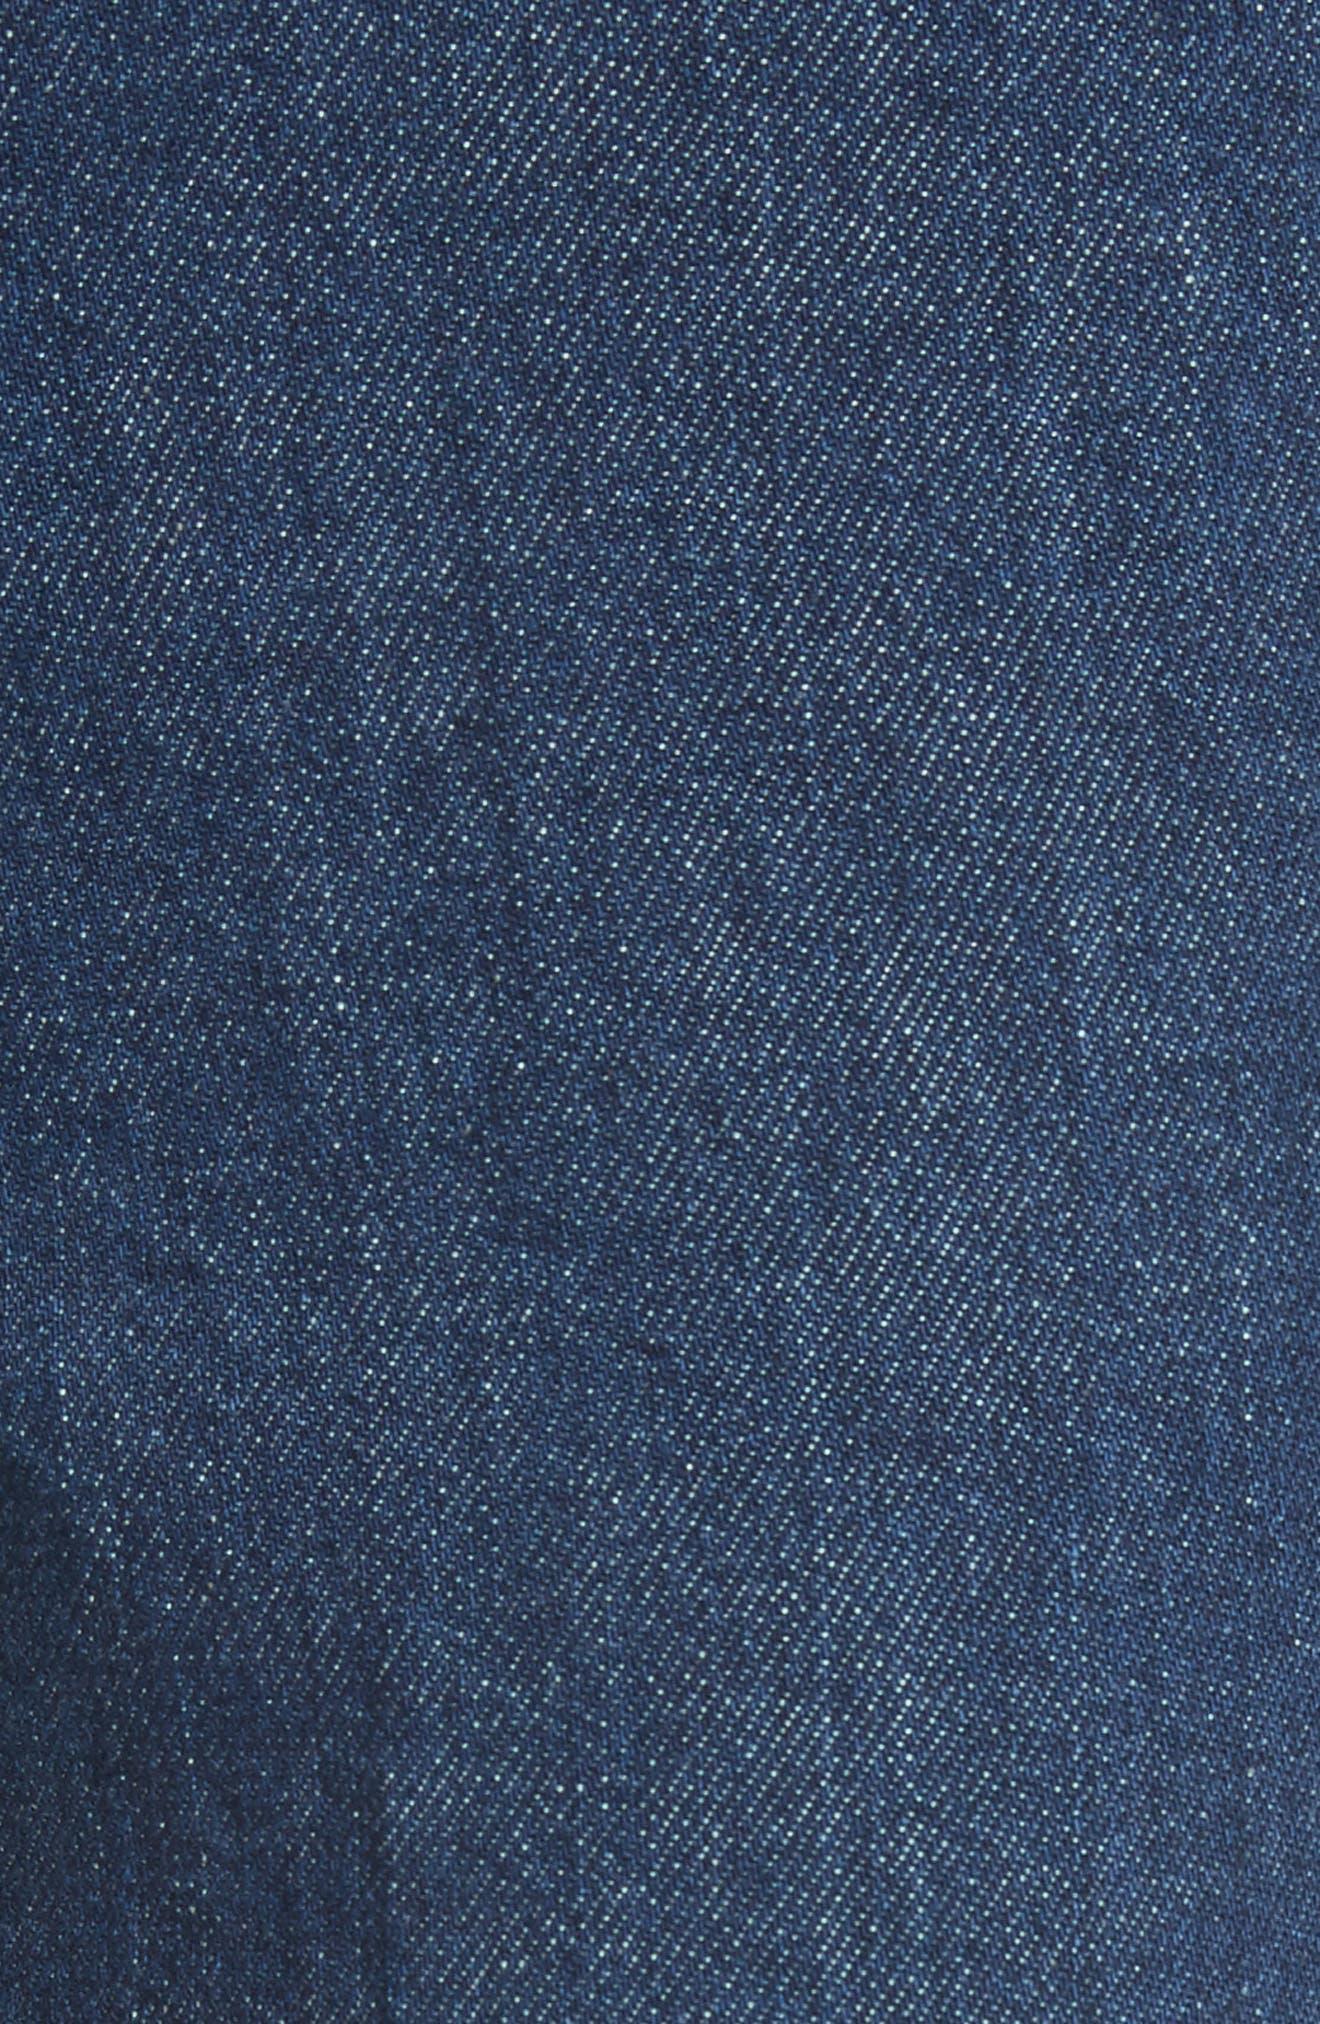 Crop Skinny Jeans,                             Alternate thumbnail 5, color,                             465